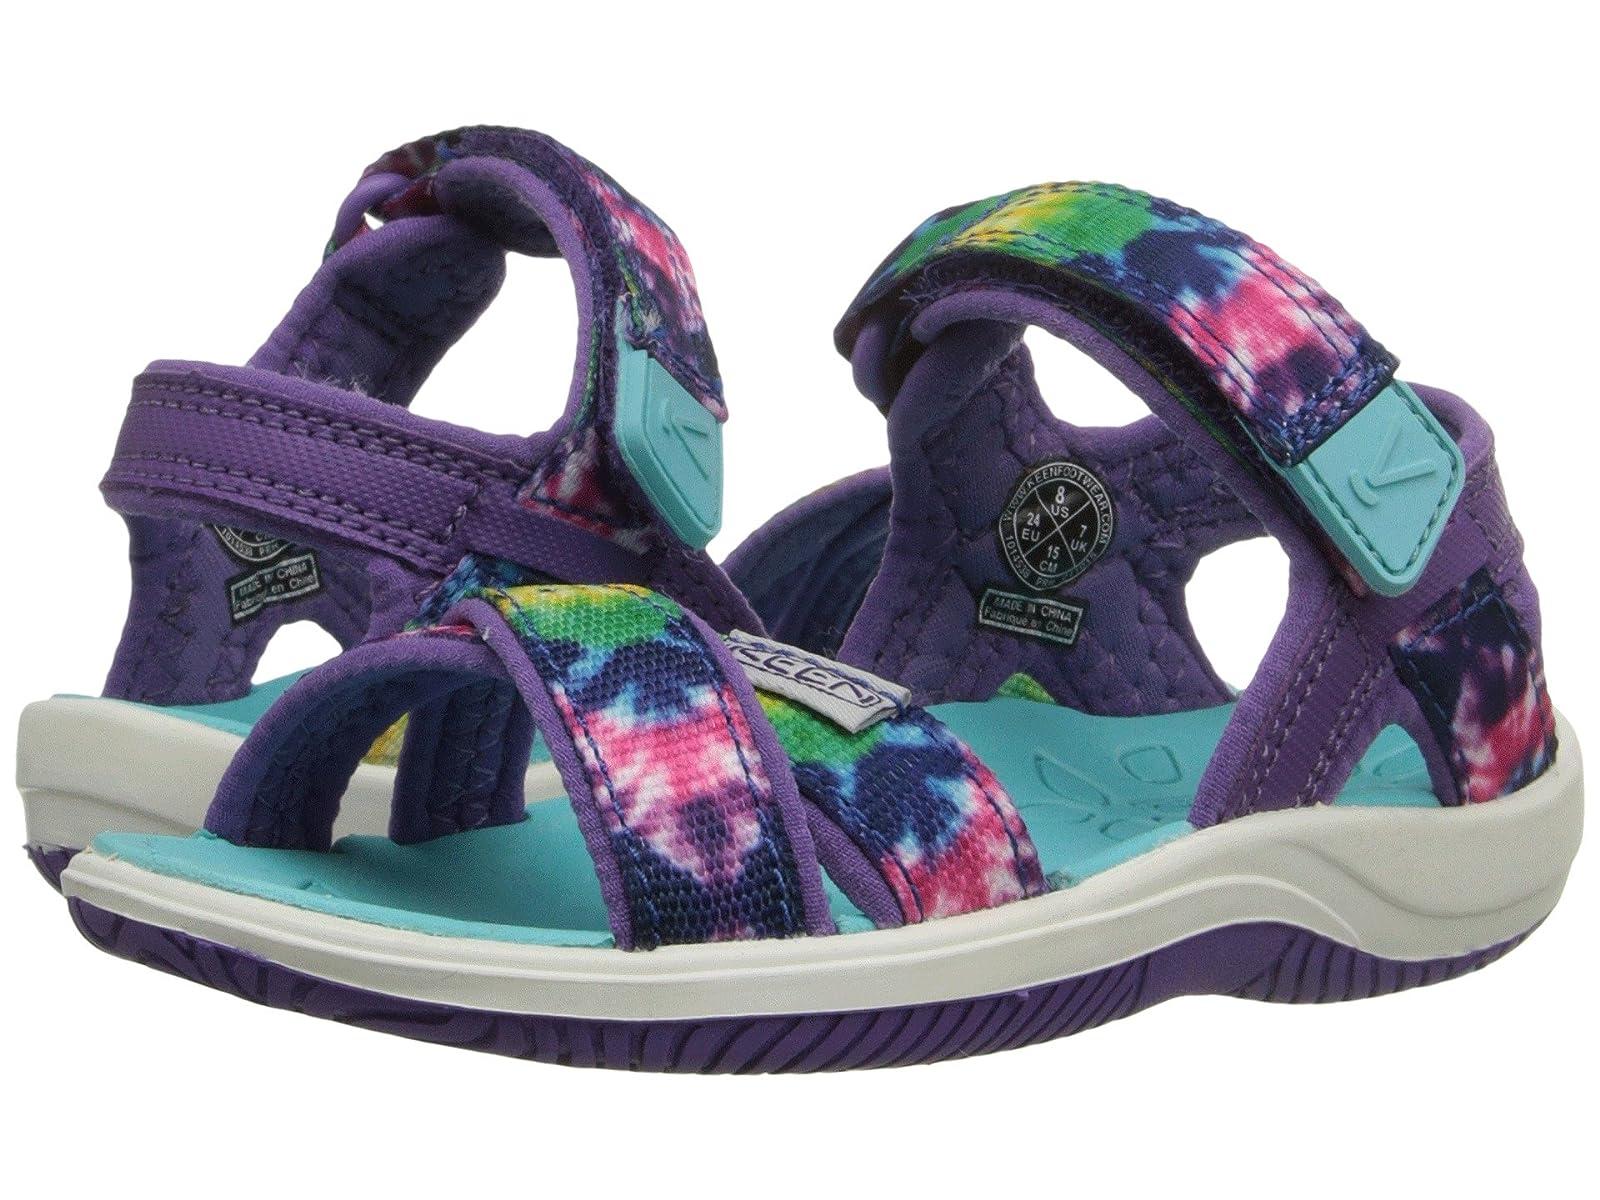 Keen Kids Phoebe (Toddler/Little Kid)Atmospheric grades have affordable shoes